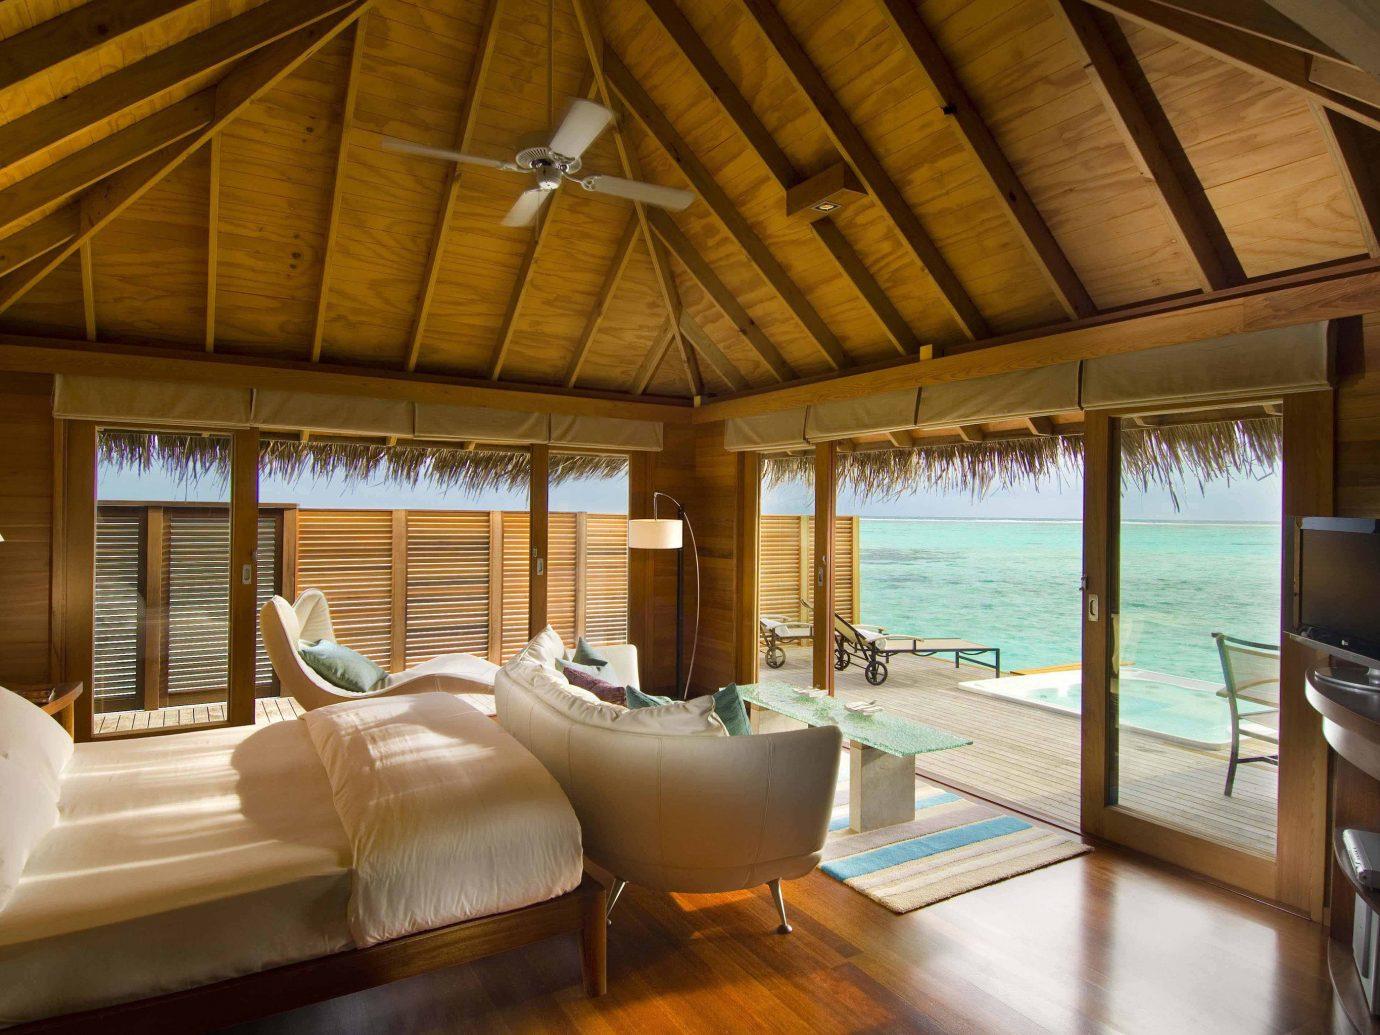 Bedroom at Conrad Maldives Rangali Island